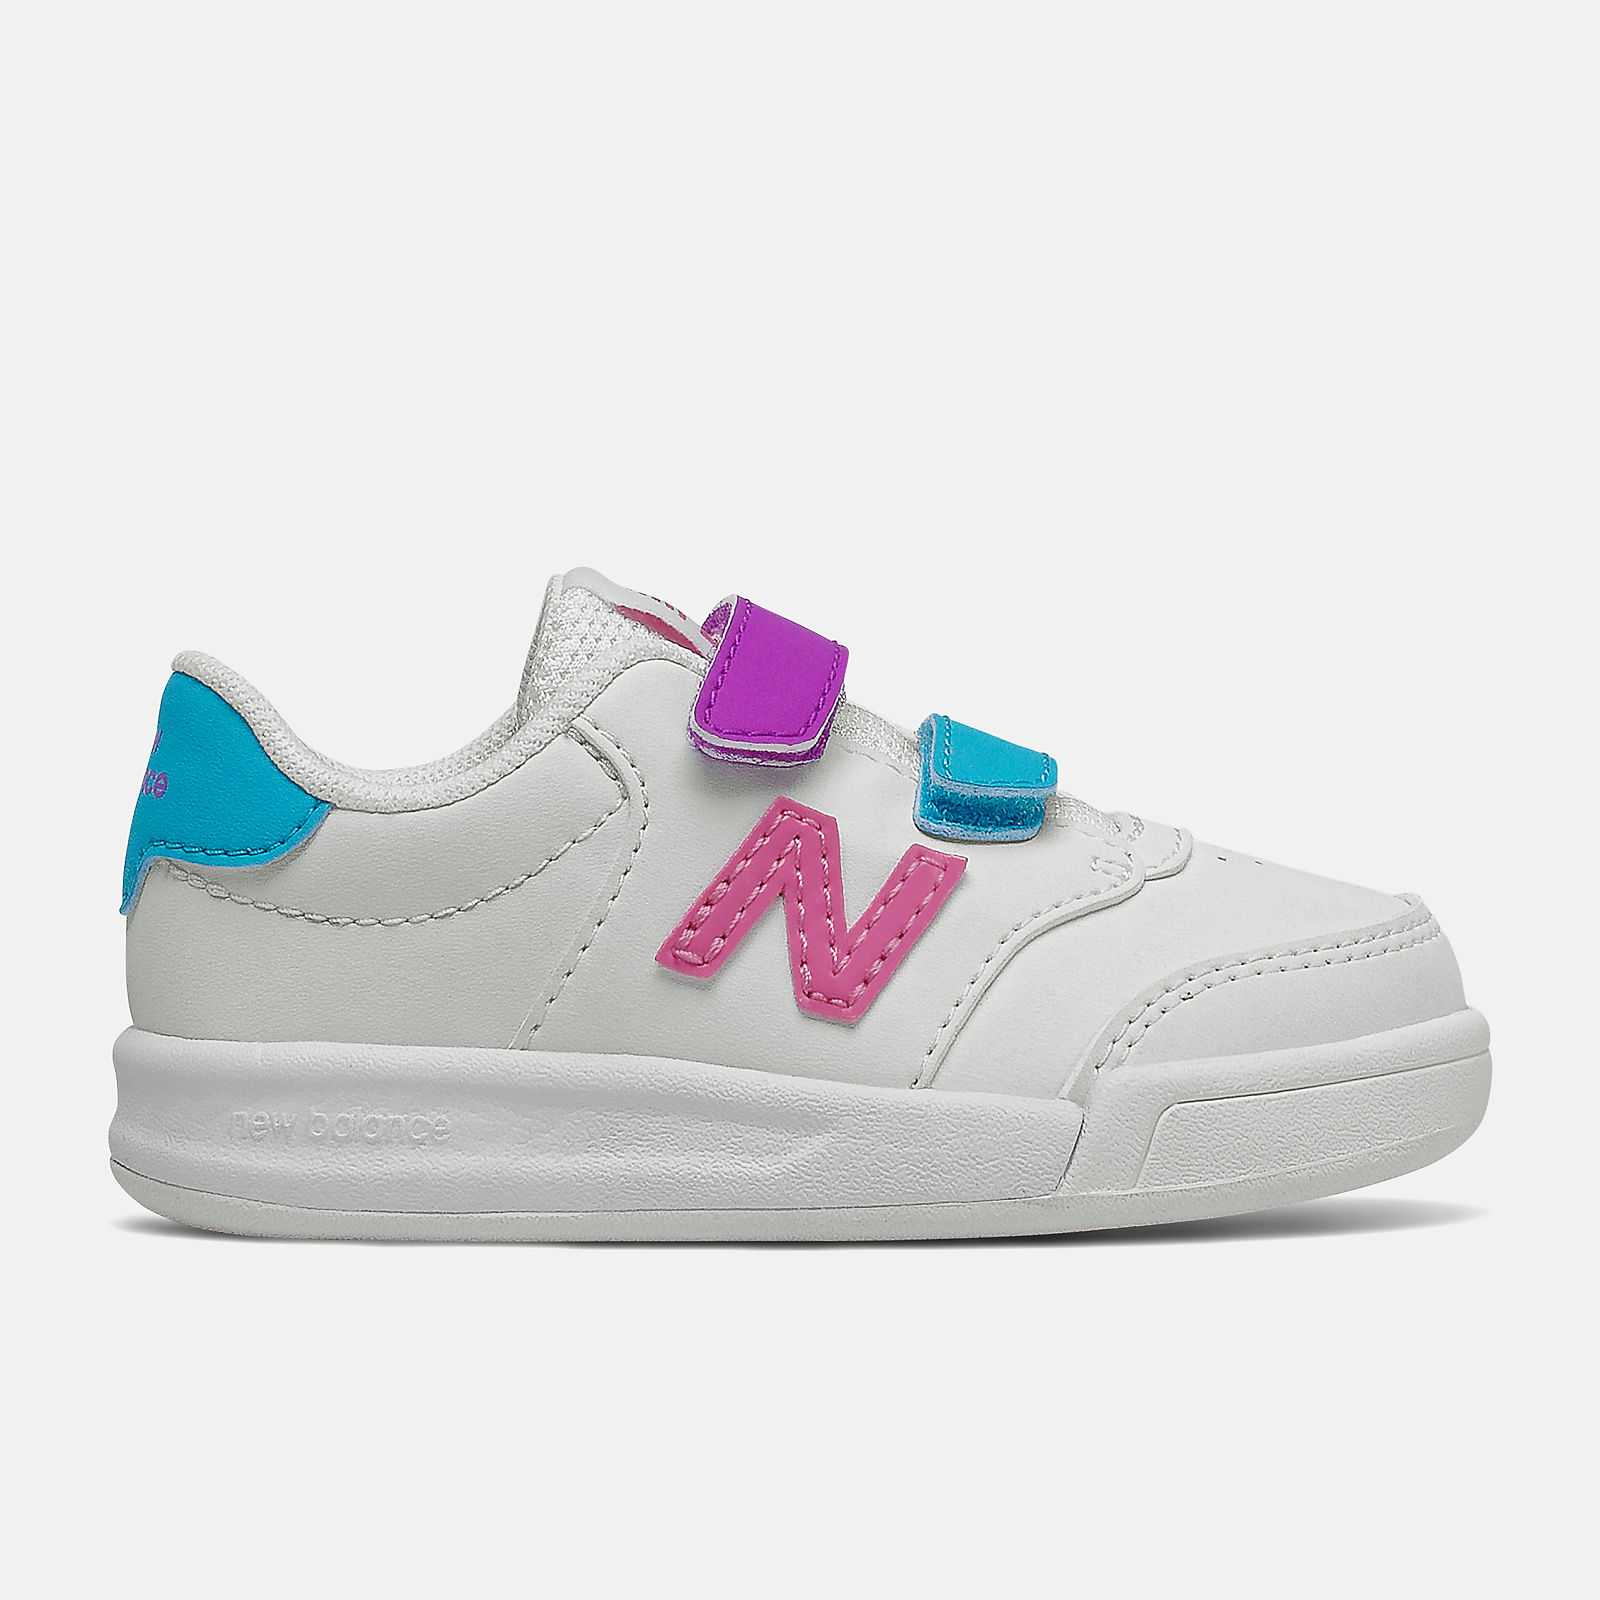 Kids CT60 Lifestyle Shoes - New Balance